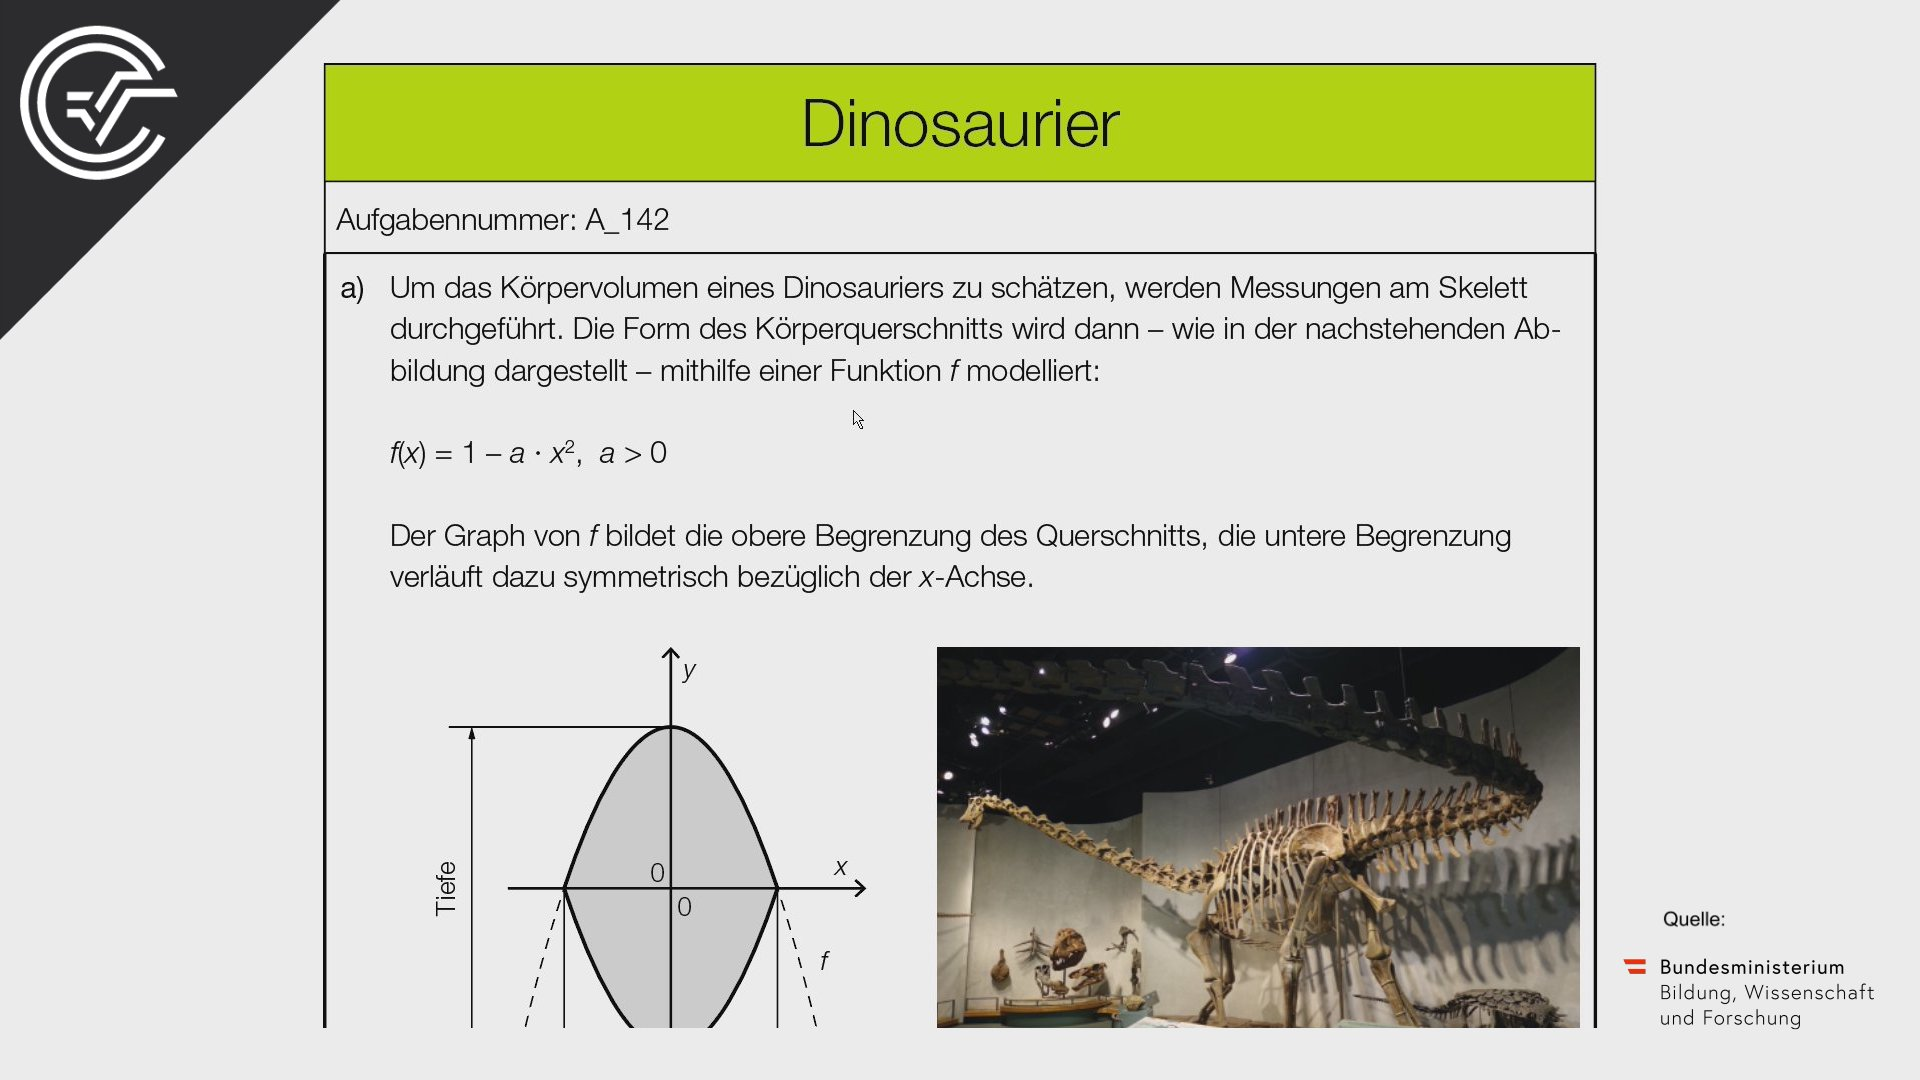 A_142 Dinosaurier Zentralmatura Mathematik BMB Aufgabenpool BHS BRP Teil A Bifie